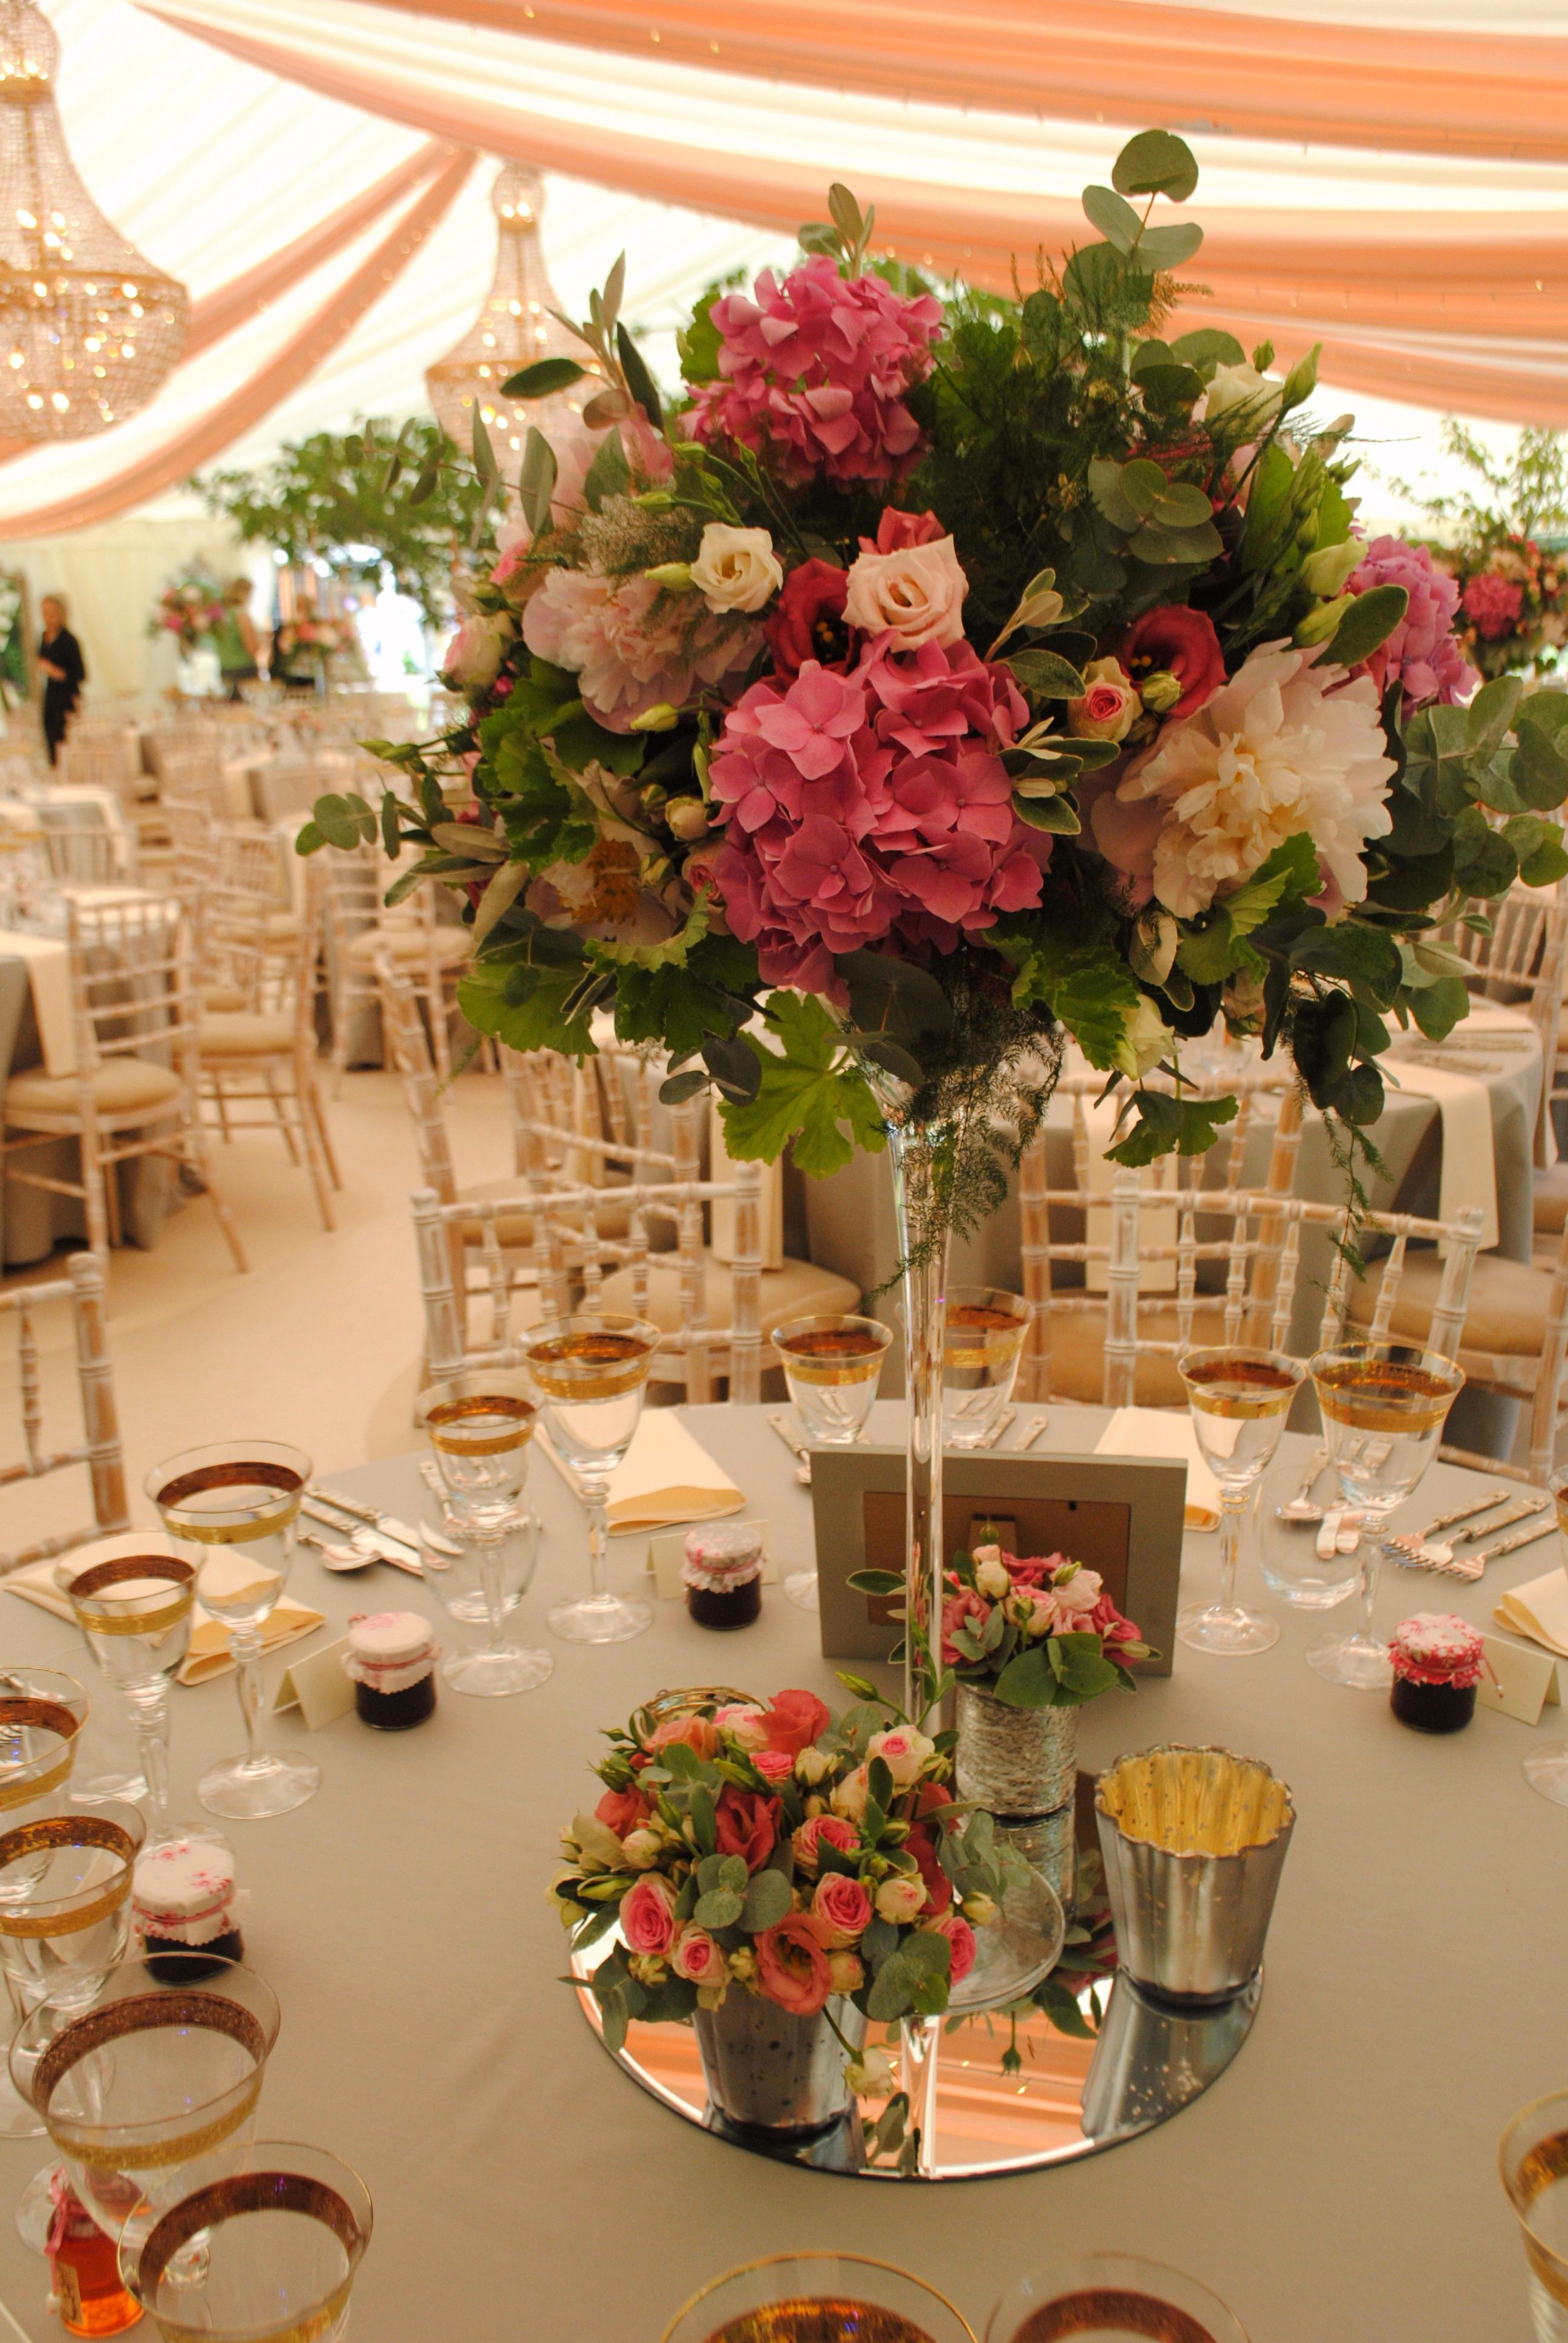 traditional dutch tulip vases of flower arrangement in vase best of wedding flower design regarding flower arrangement in vase best of wedding flower design inspirational flower arrangement picture